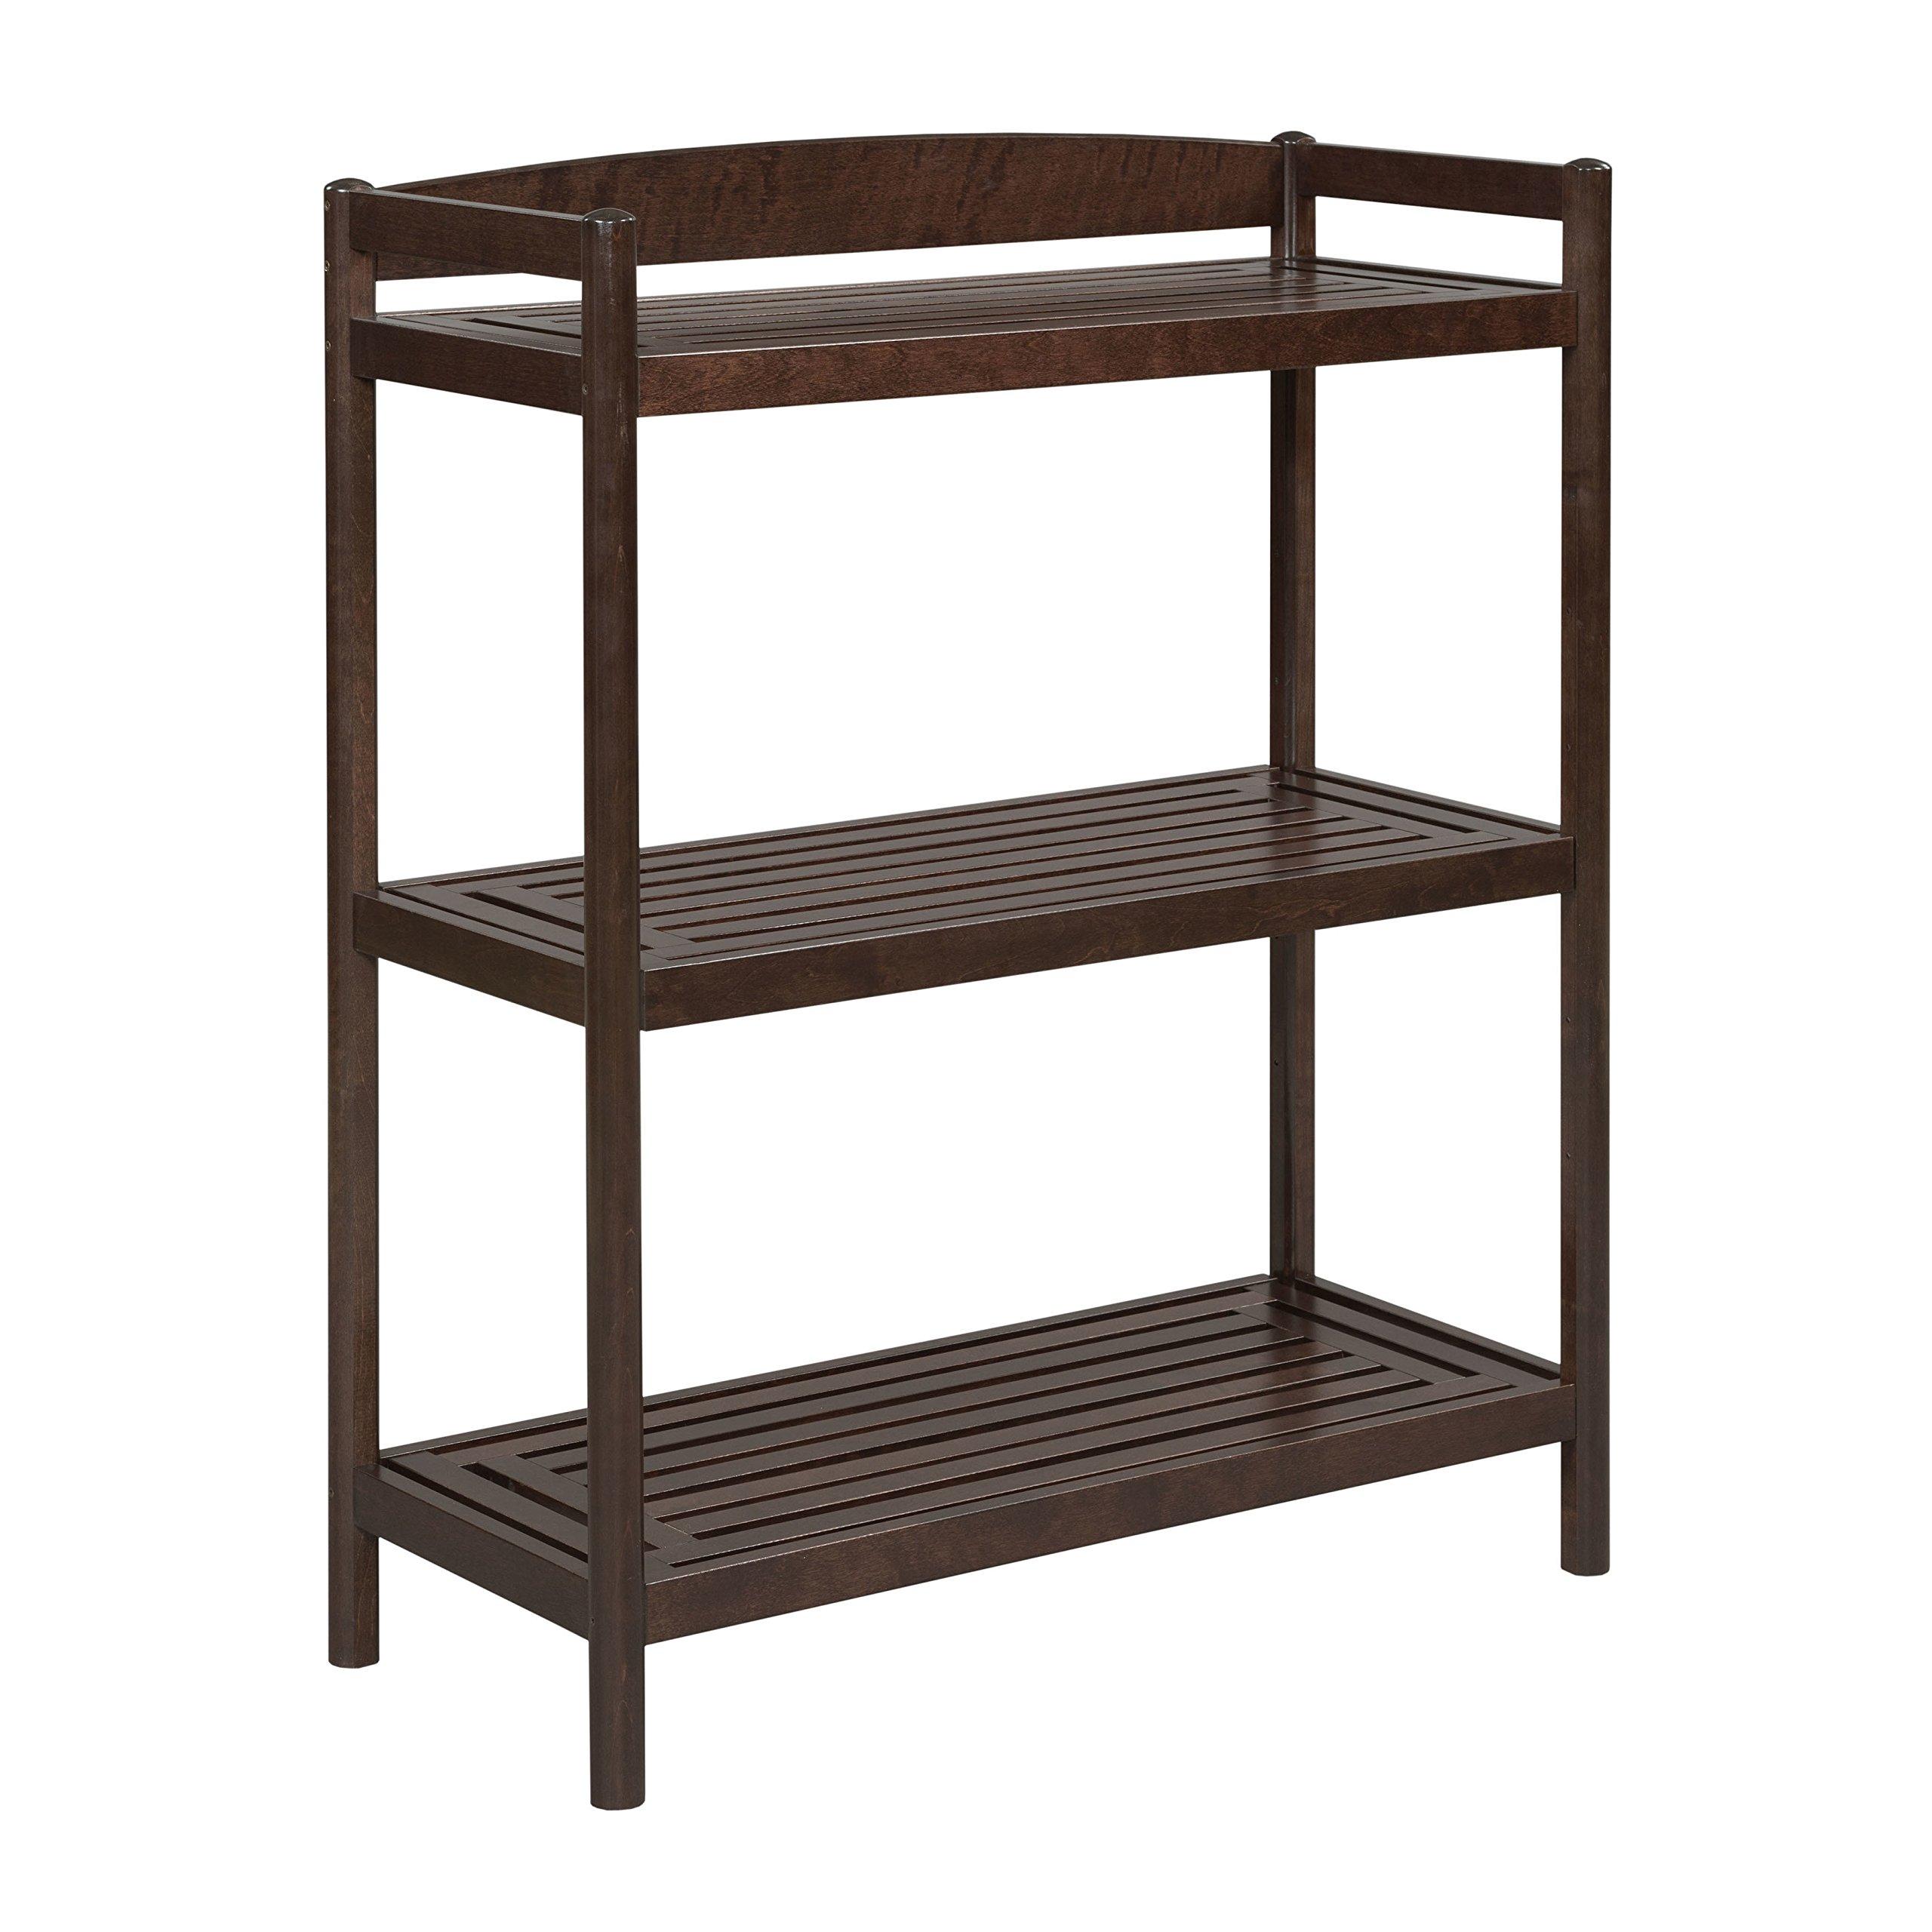 New Ridge Home Goods Exmore Bookshelf / Media Console with Adjustable Shelf, Merlot